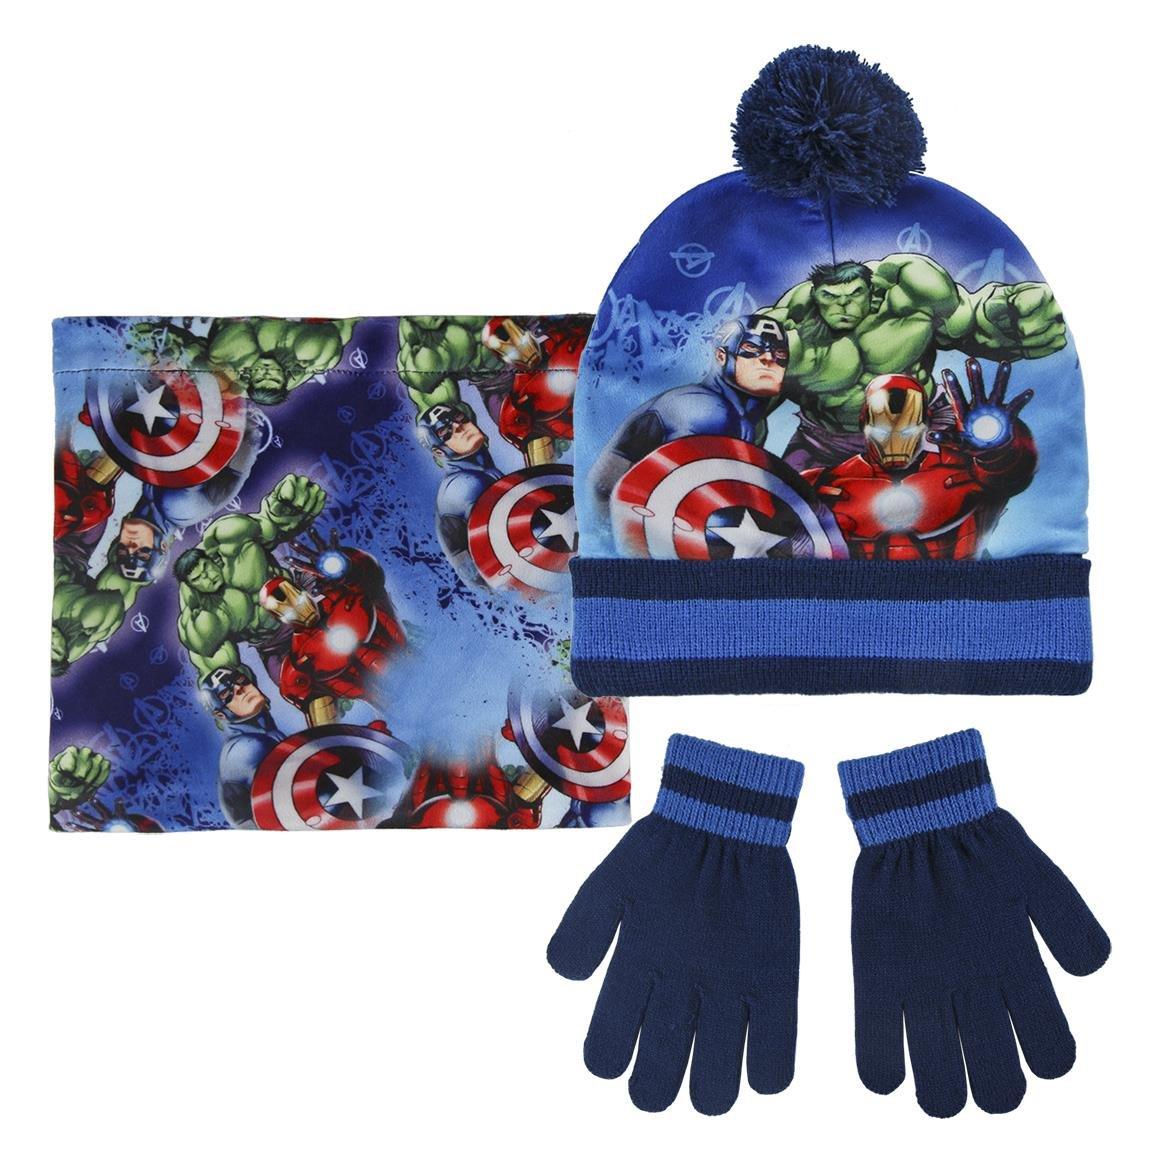 ef2c59519 Marvel Avengers 2200-2542 Childrens Winter Set, Beanie Hat With ...